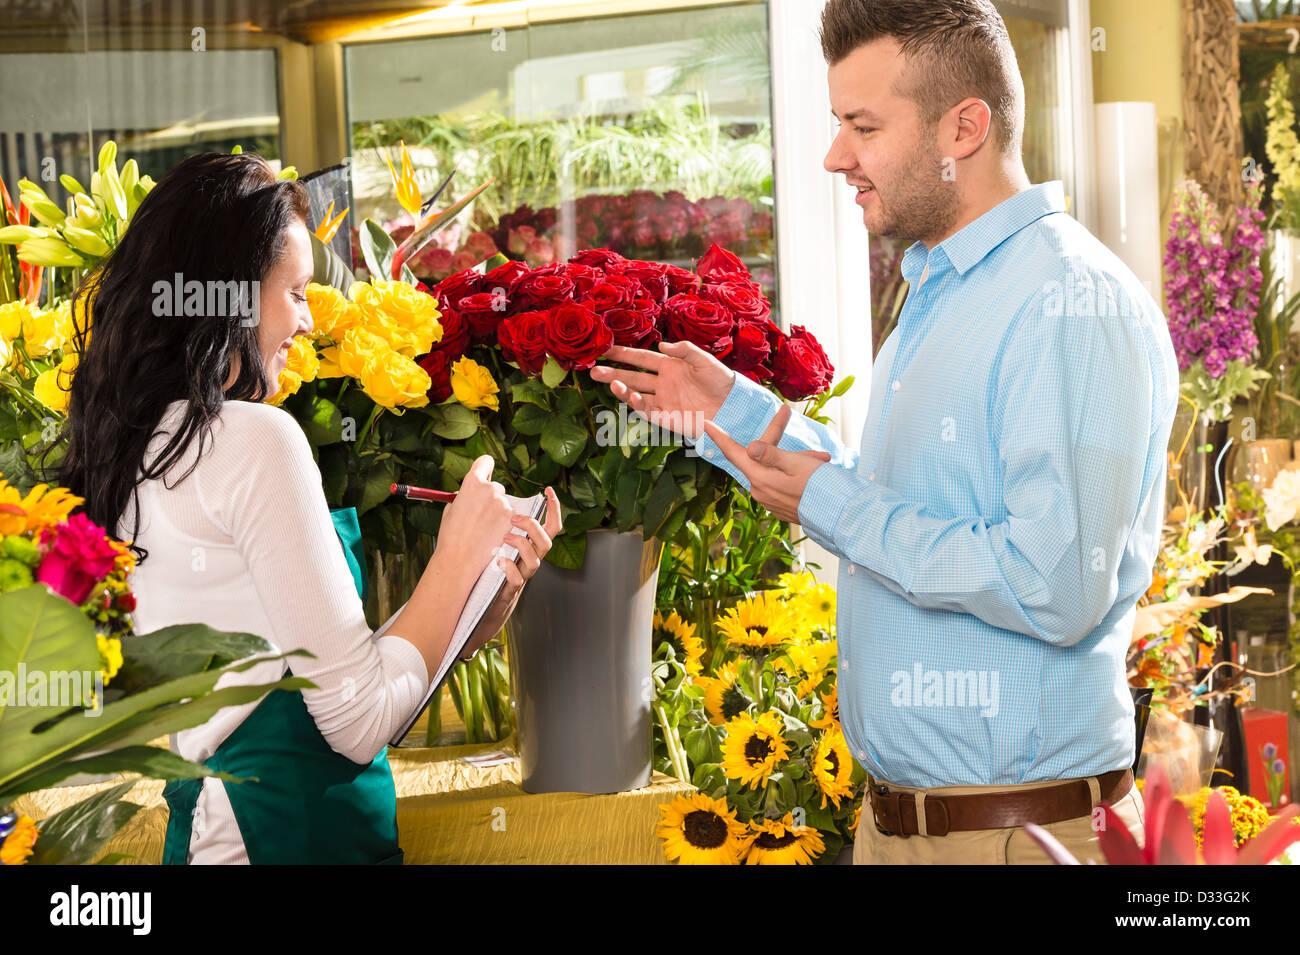 Man customer ordering flowers bouquet flower shop florist stock man customer ordering flowers bouquet flower shop florist izmirmasajfo Image collections